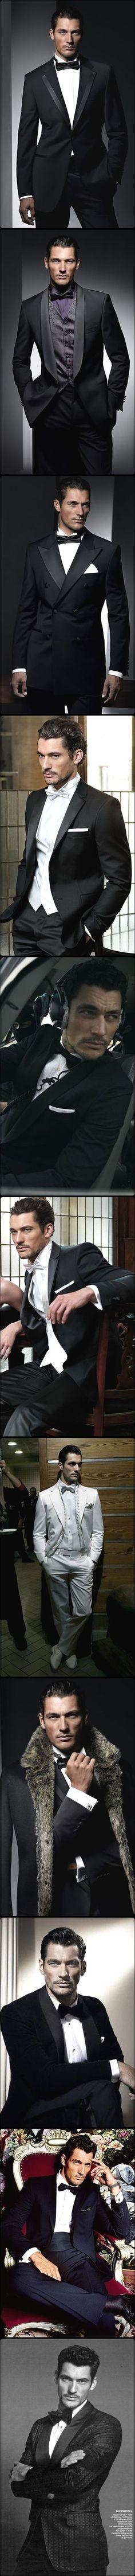 tuxedo, david gandy, black tie attire, david gandi, suit, dress up